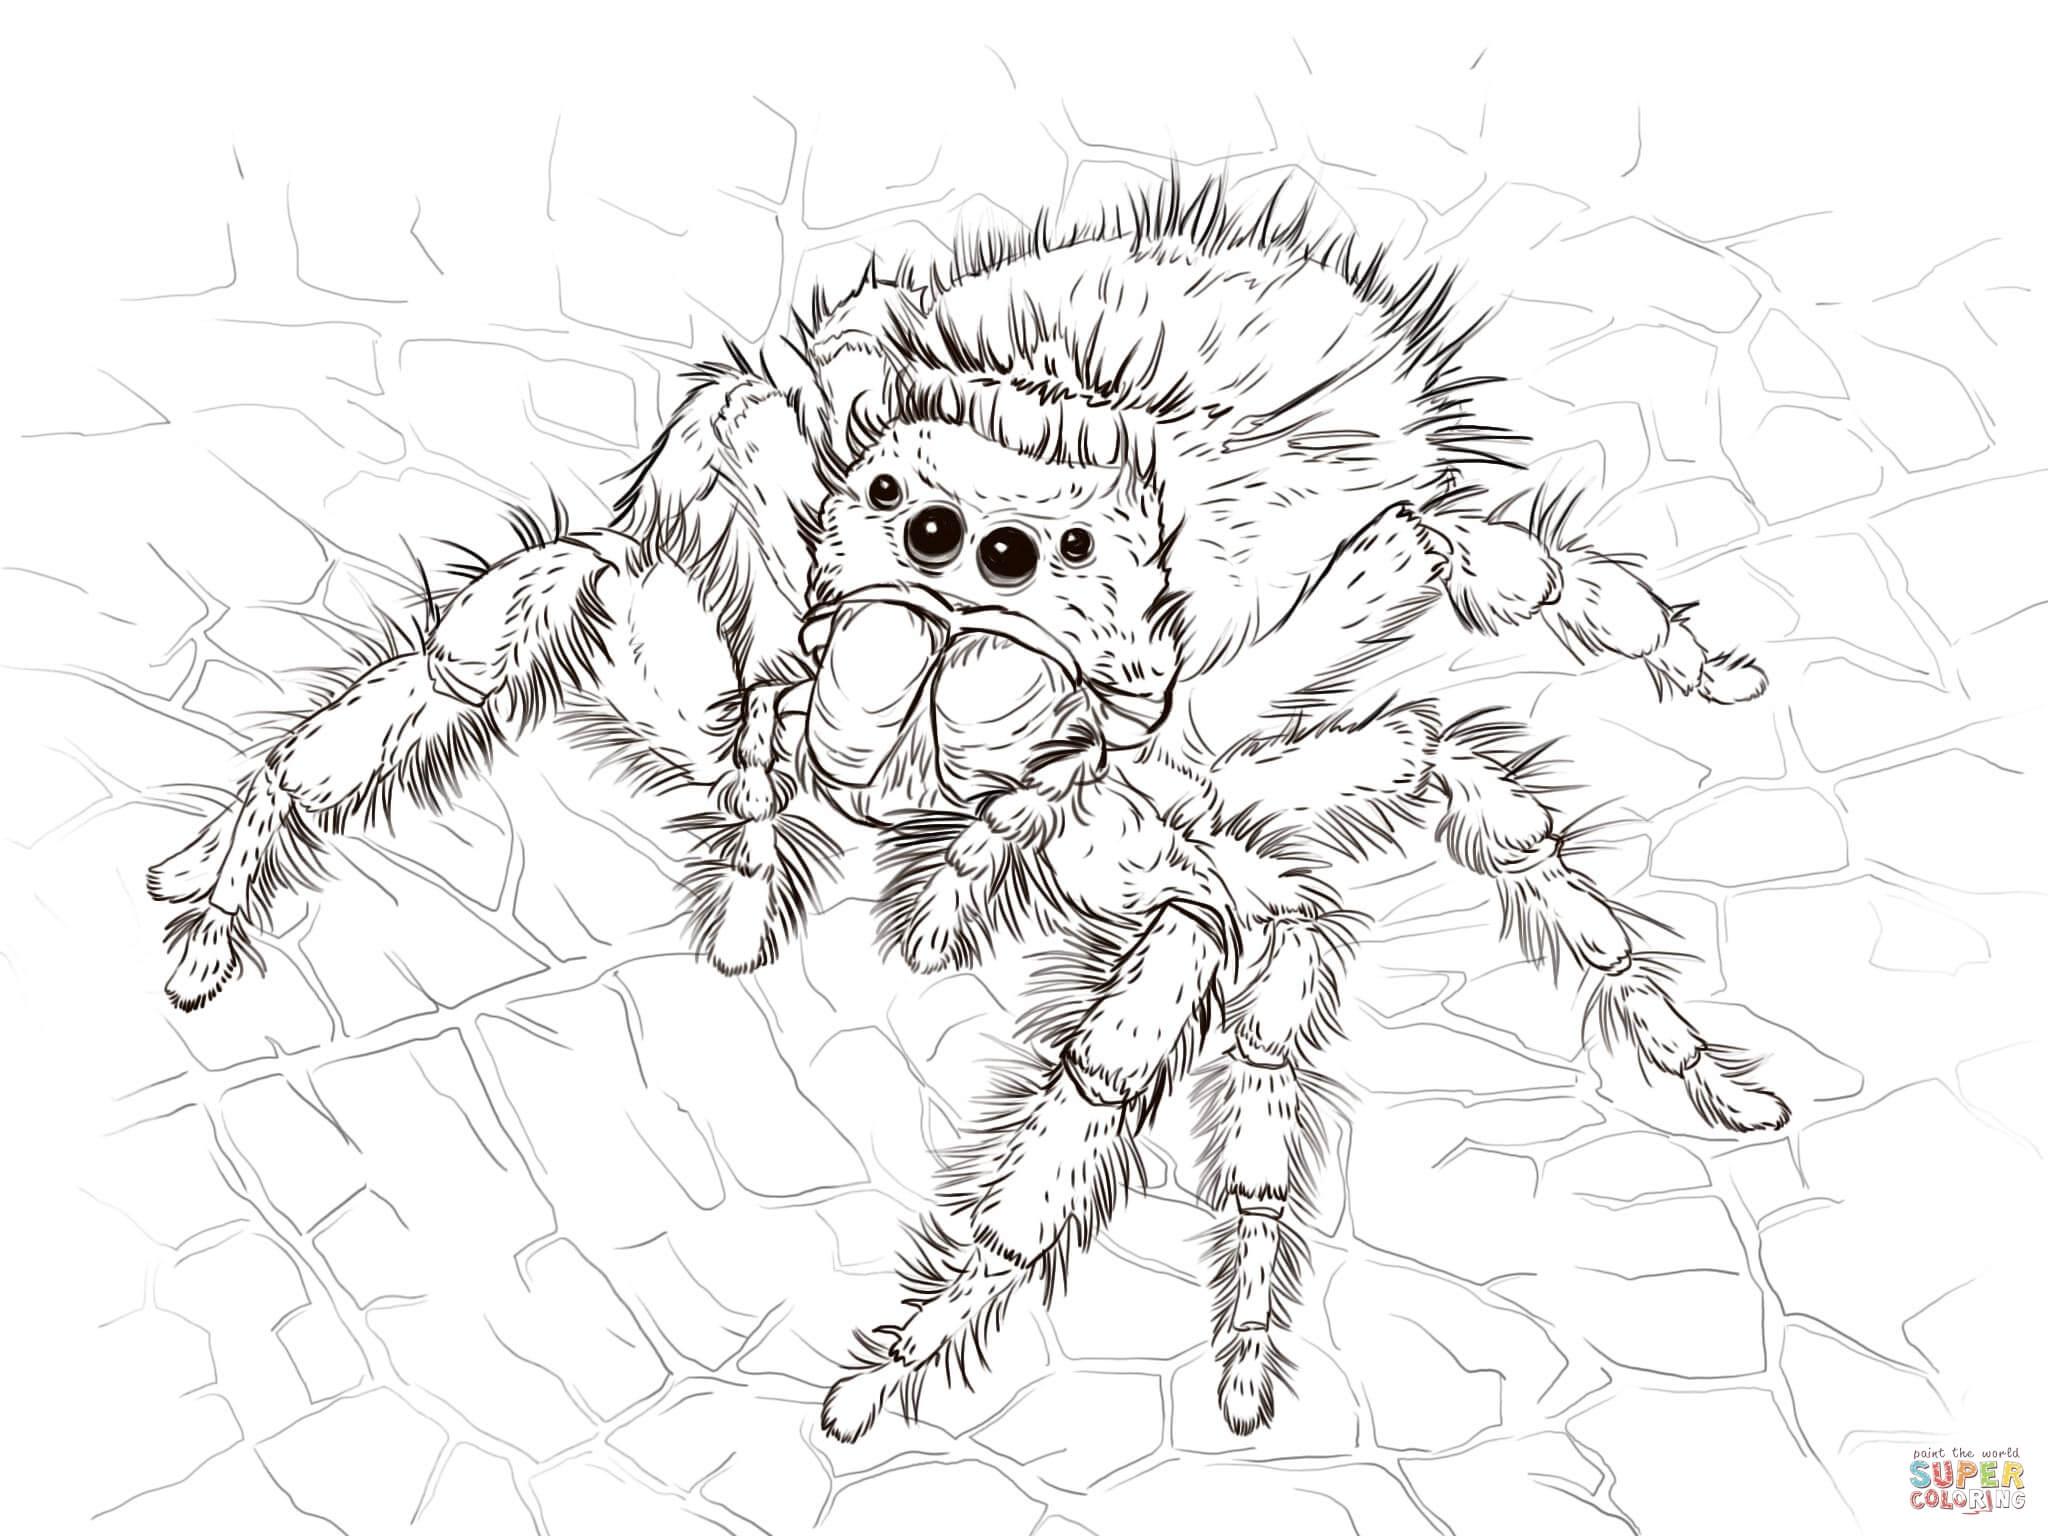 Daring Jumping Spider Coloring Page